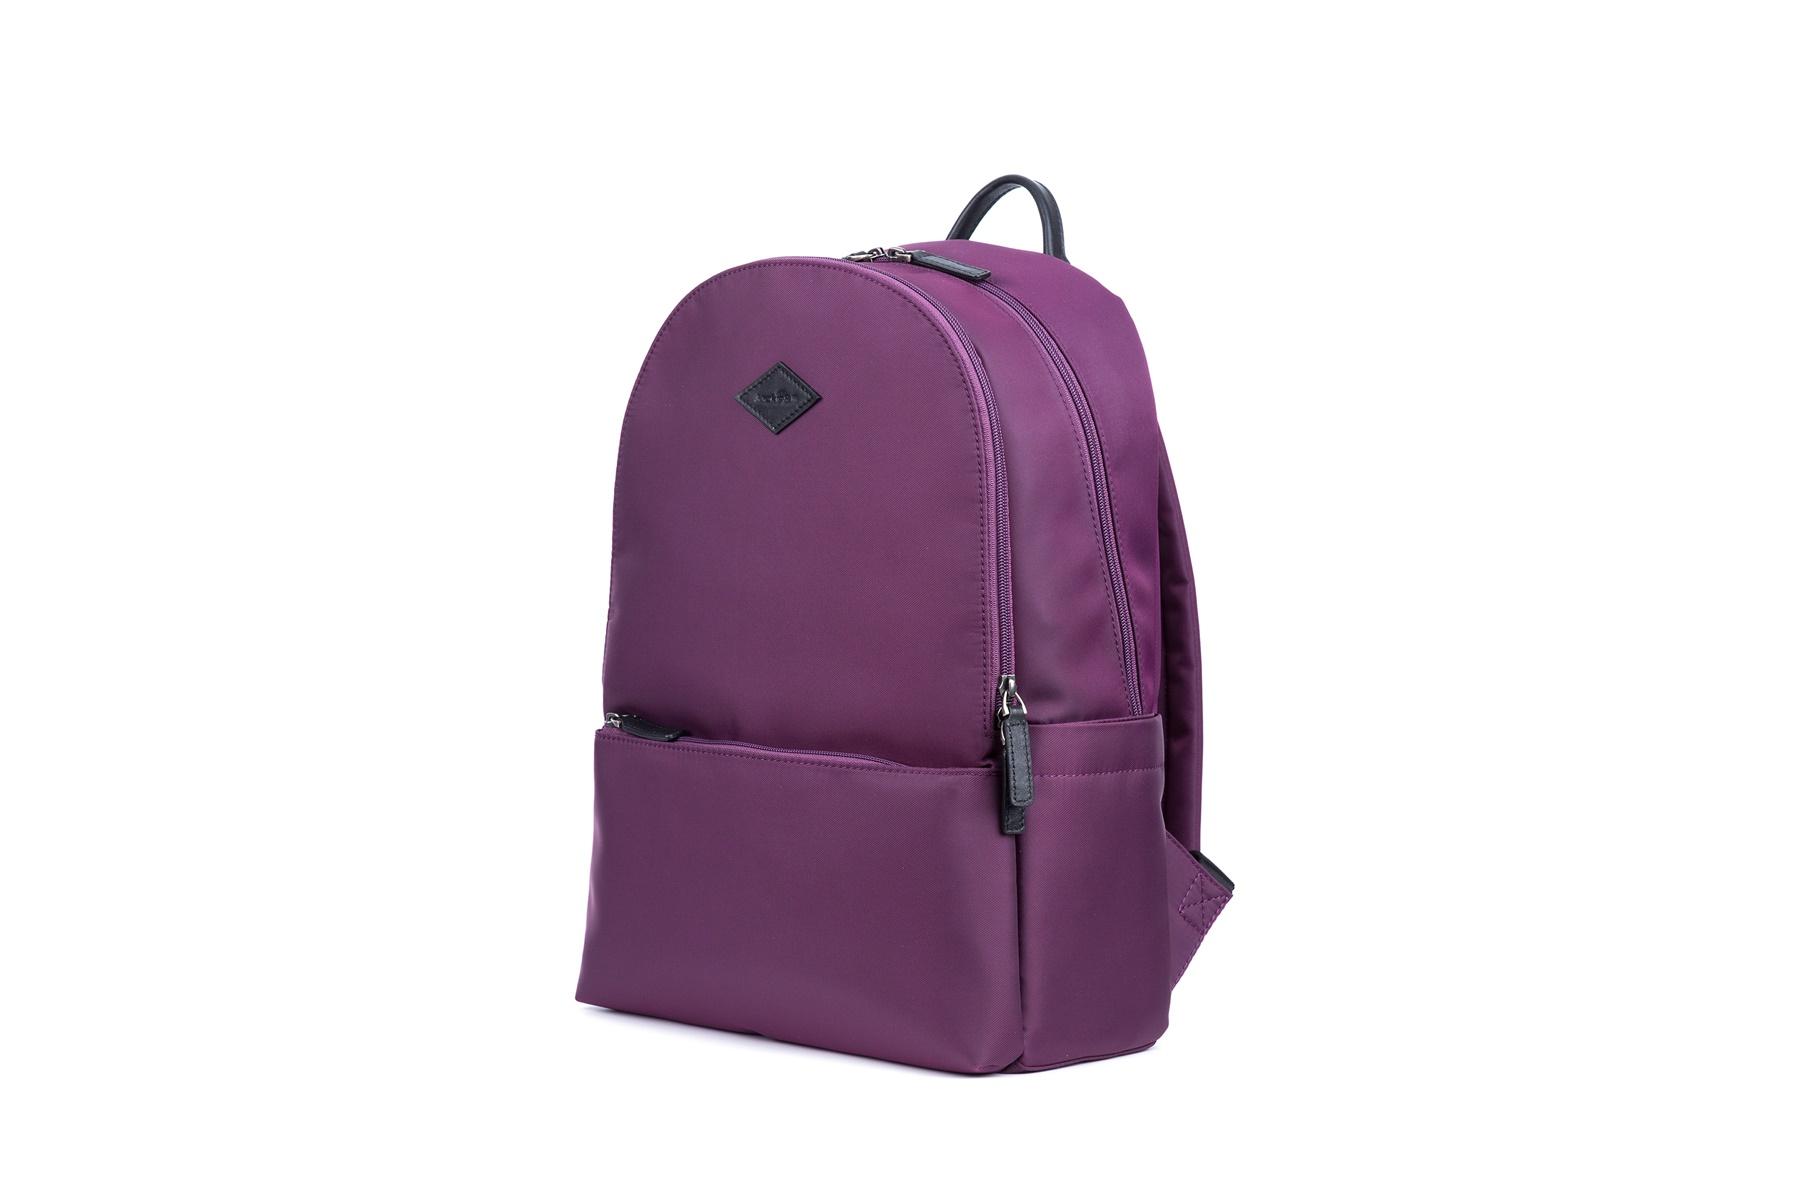 GF bags-Professional Stylish Backpacks Big Backpack Bags Manufacture-5